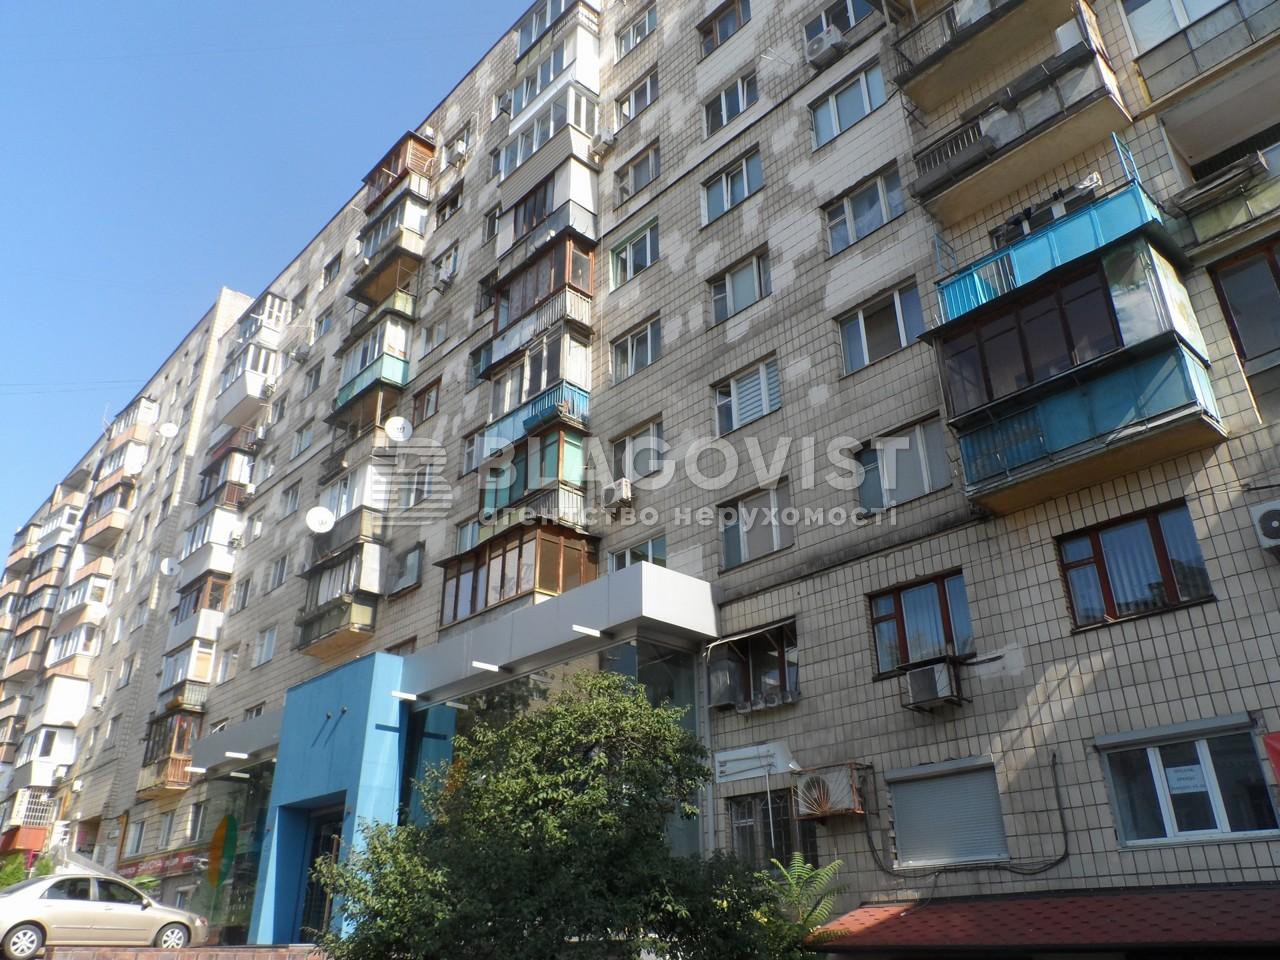 Квартира F-45467, Владимирская, 89/91, Киев - Фото 1